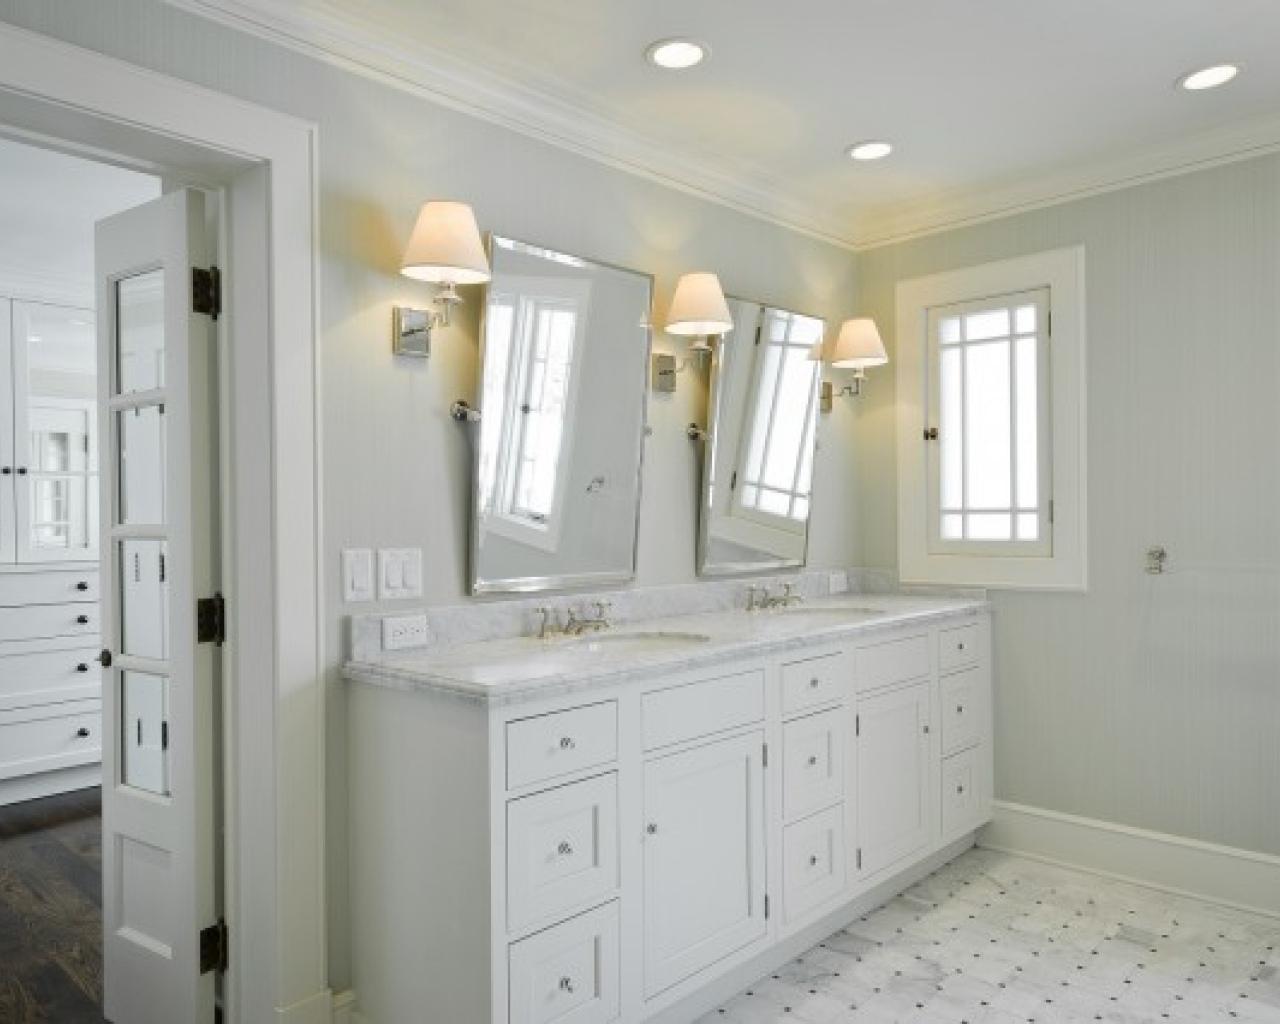 Tilting Bathroom Wall Mirror, Tilt Bathroom Vanity Mirrors Pertaining To Most Popular Tilt Wall Mirrors (View 15 of 20)